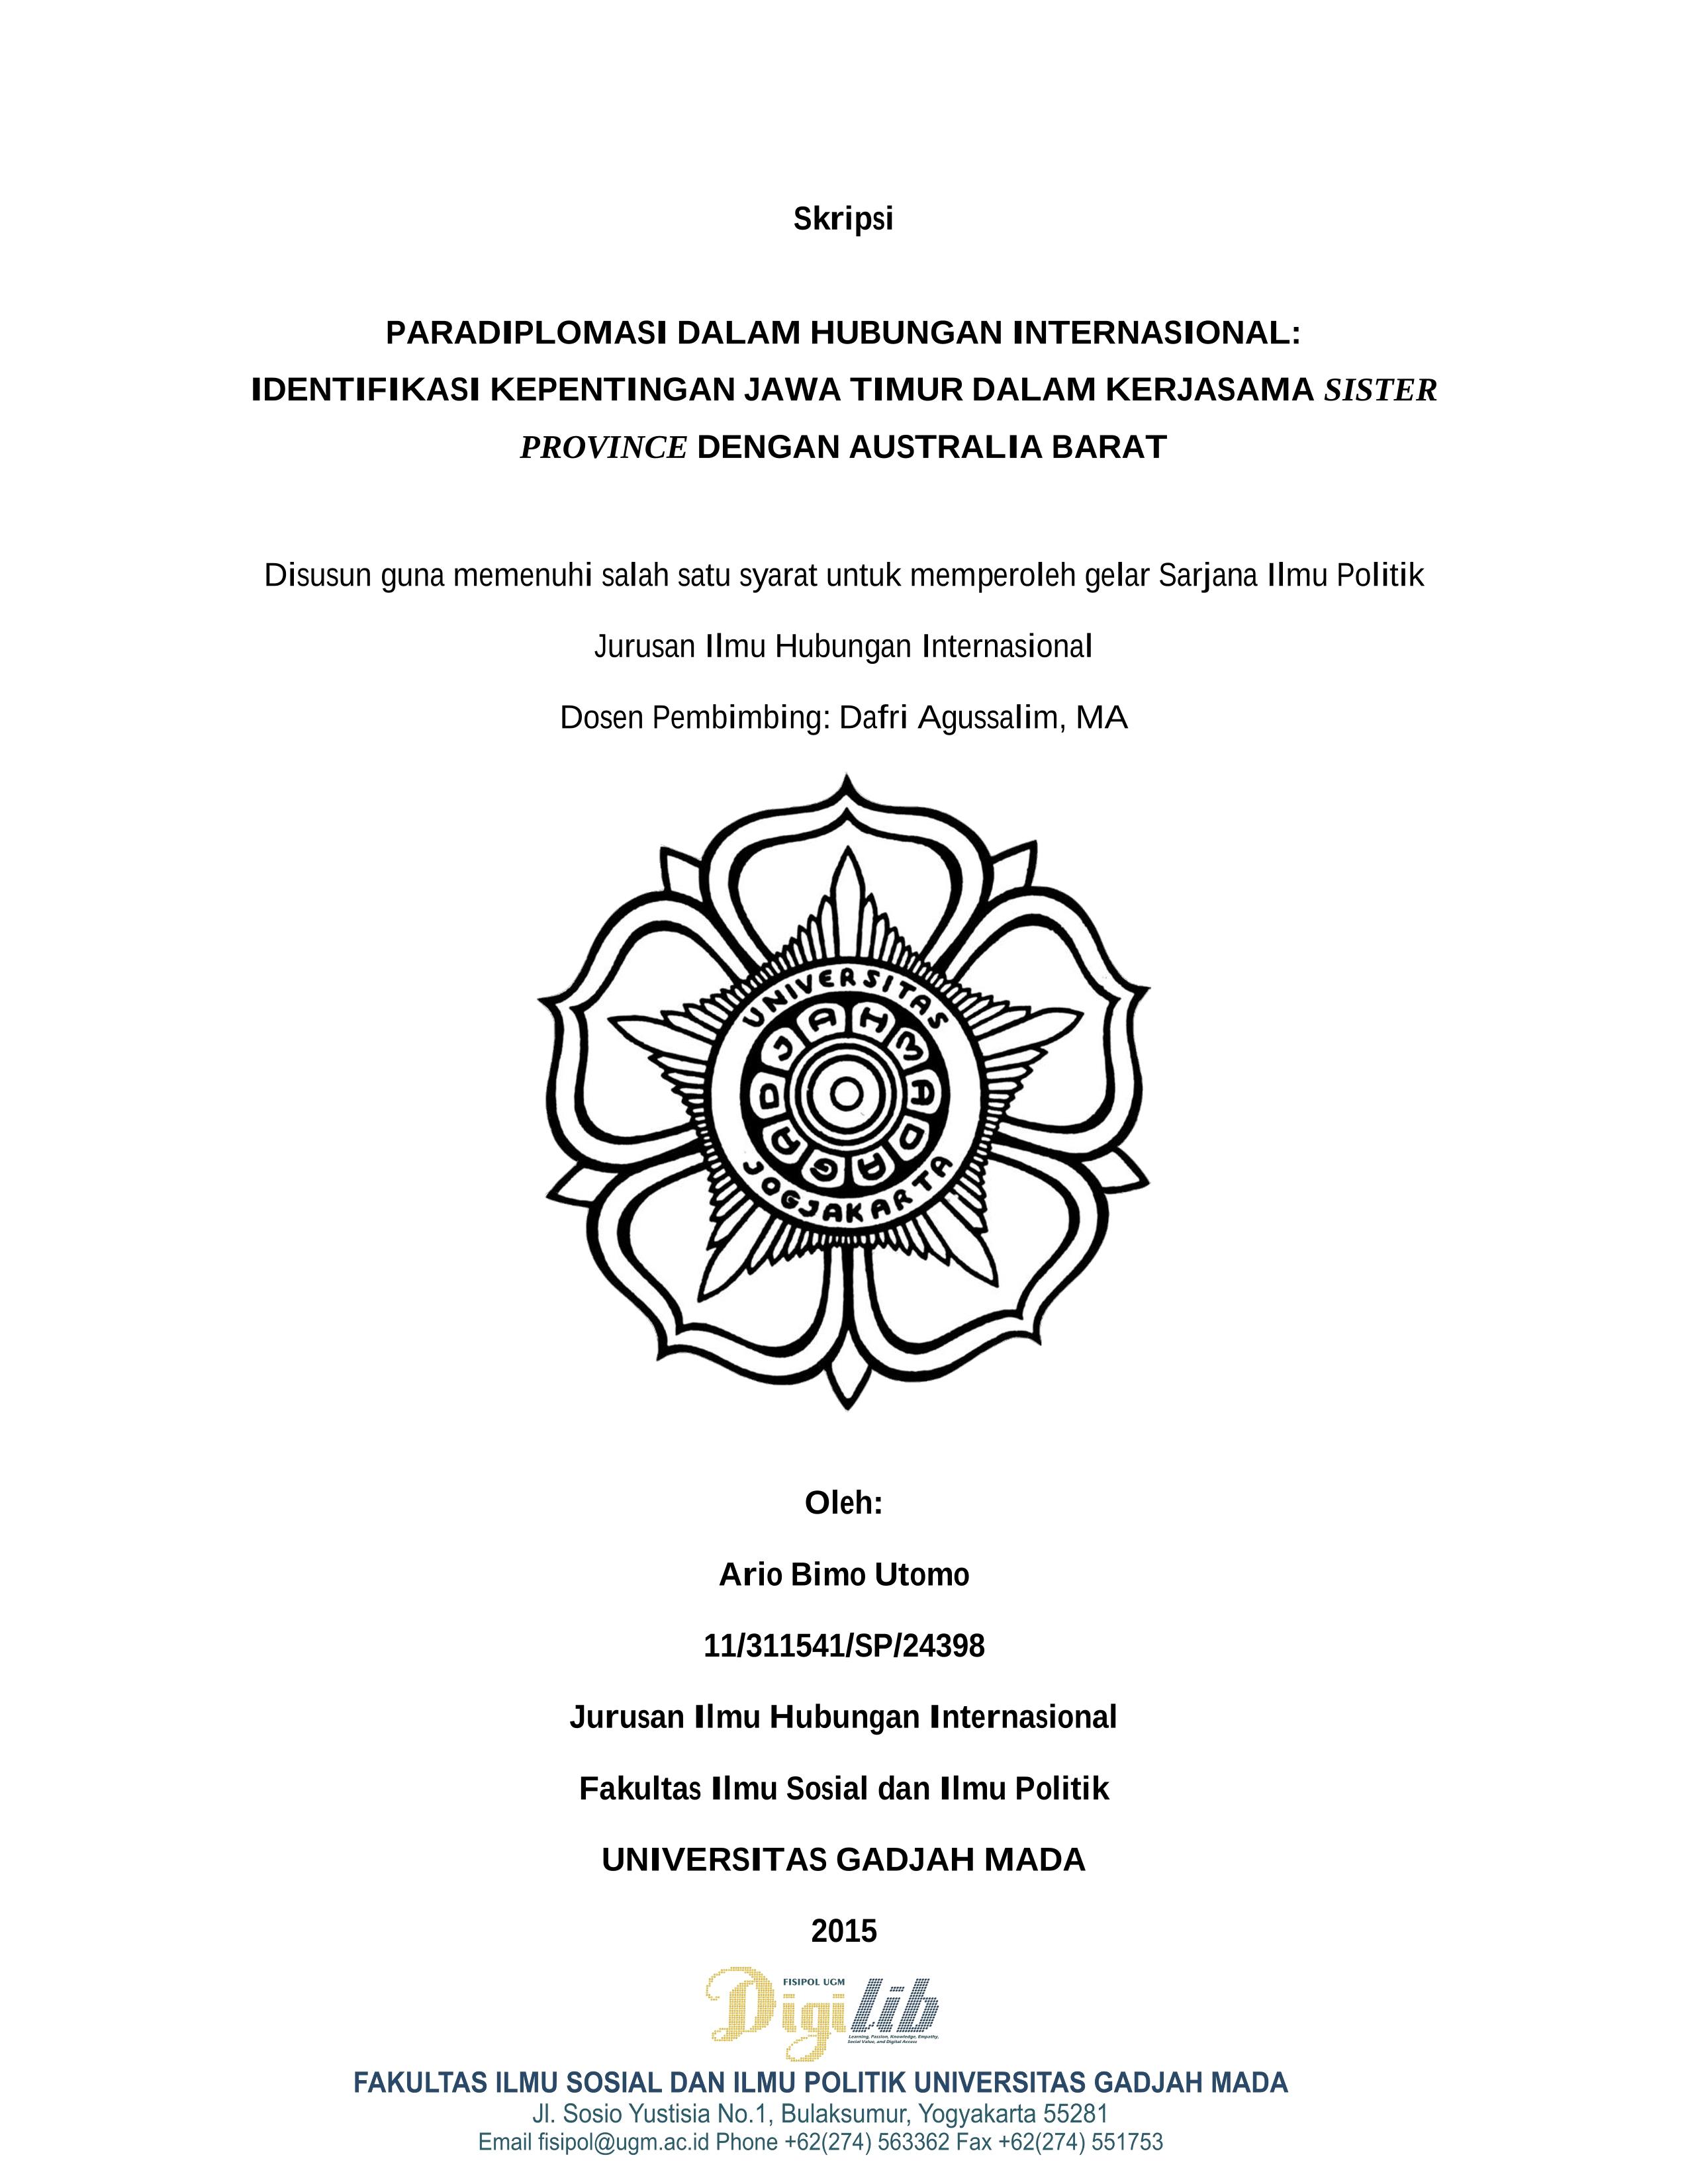 Digilib Fisipol Ugm Yogyakarta Indonesia Learning Passion Knowledge Empathy Social Value And Digital Access Paradiplomasi Dalam Hubungan Internasional Identifikasi Kepentingan Jawa Timur Dalam Kerjasama Sister Province Dengan Australia